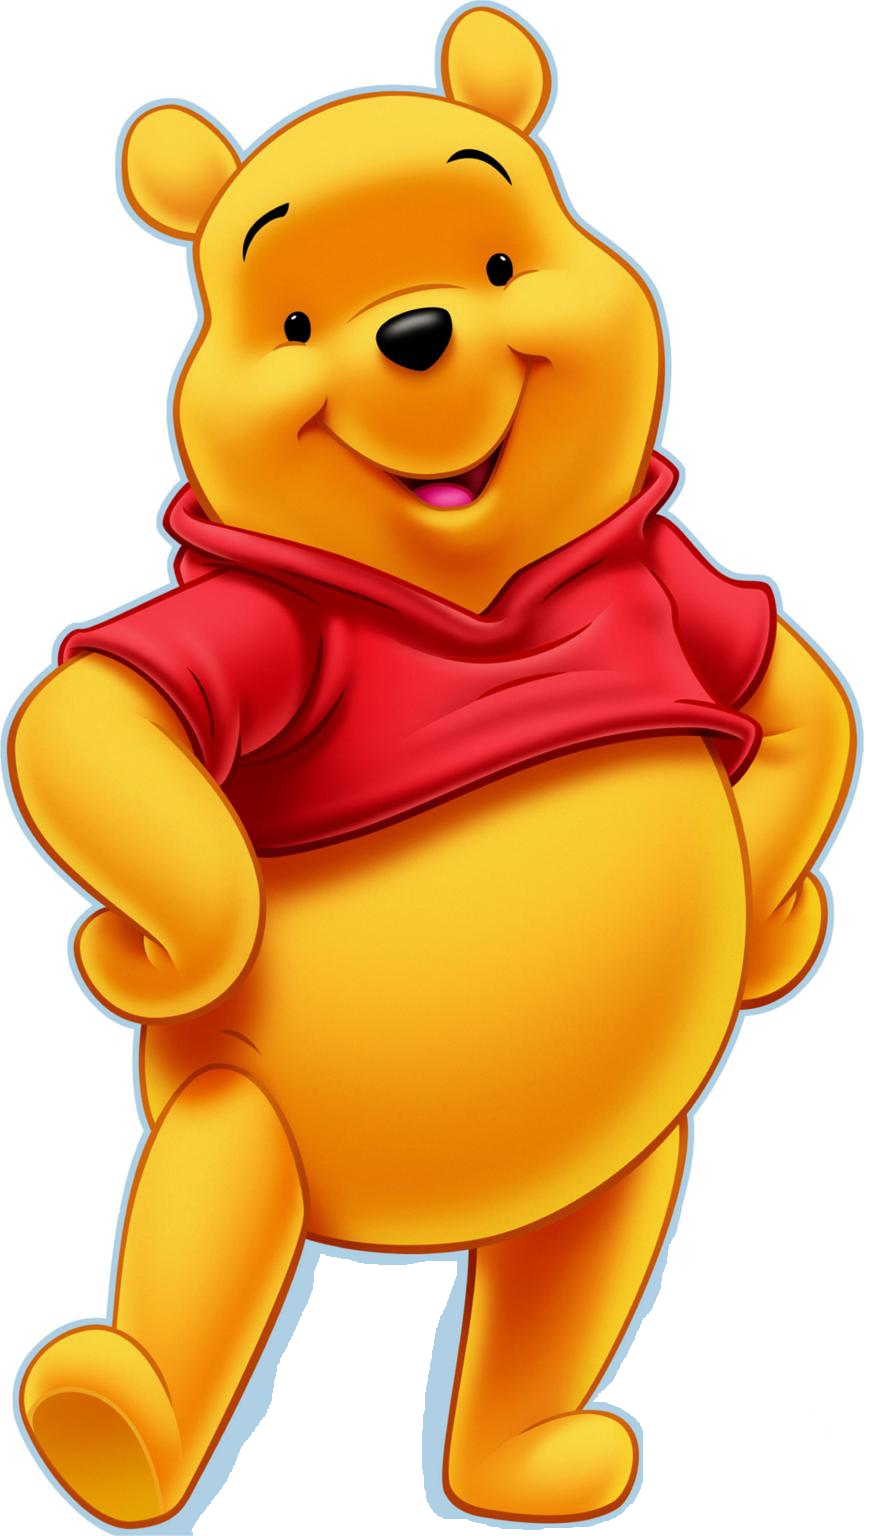 Image  Winnie The Poohpng  Moviepedia  FANDOM powered by Wikia